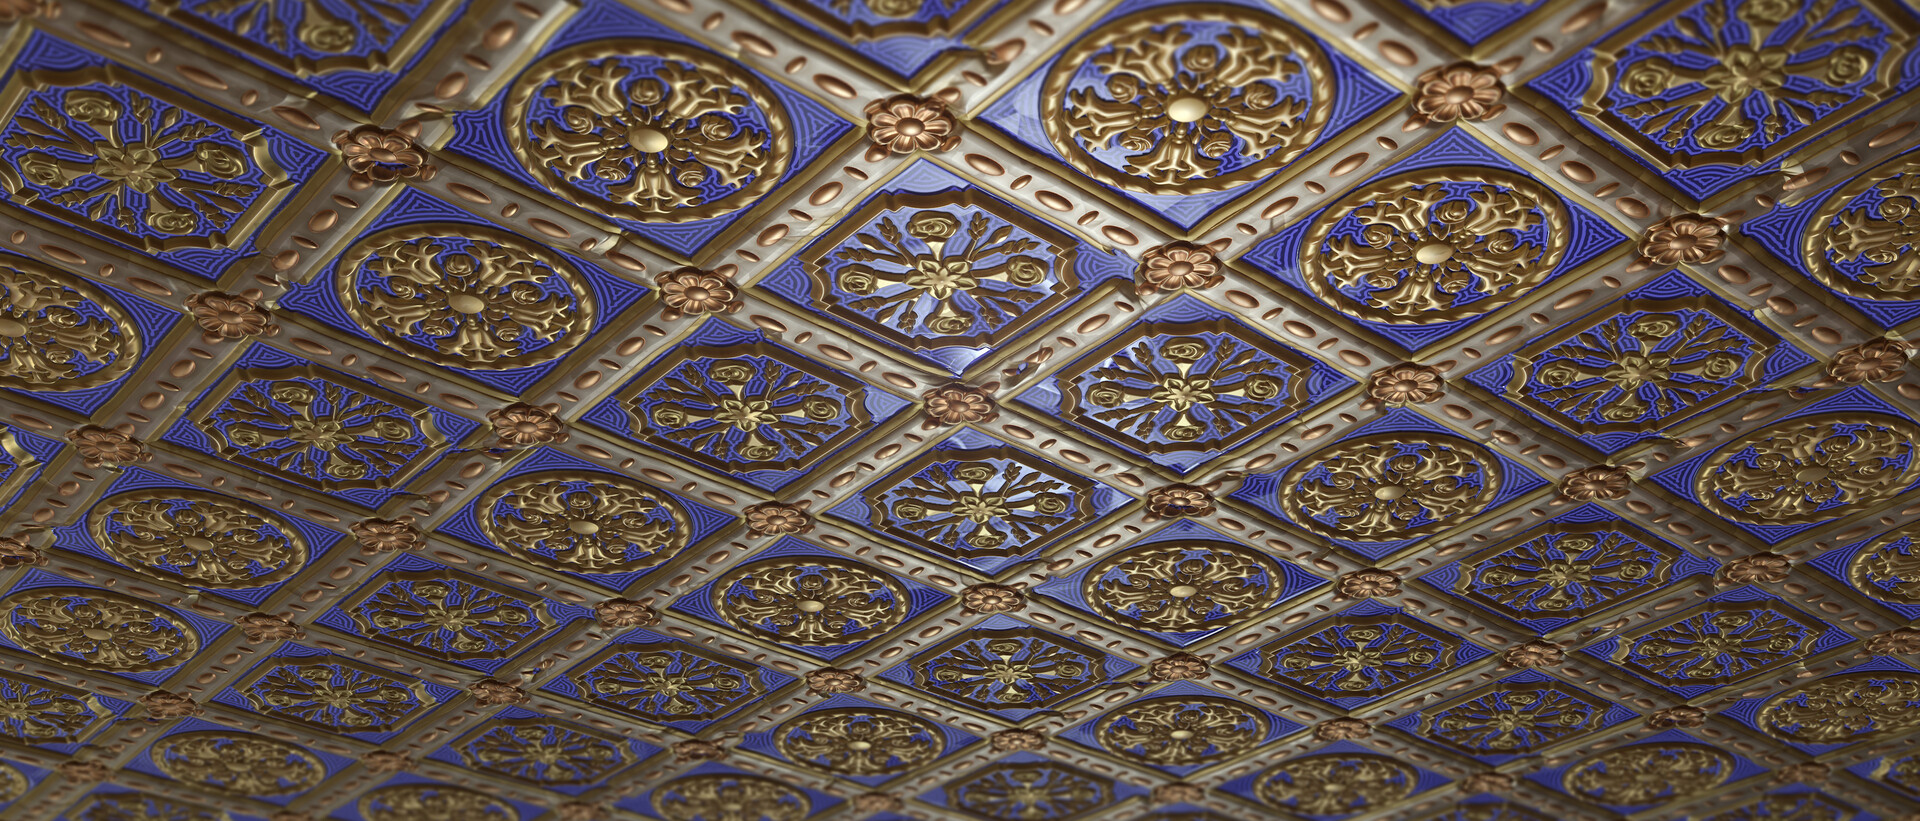 Ant skilton floralceilingpanels ceiling